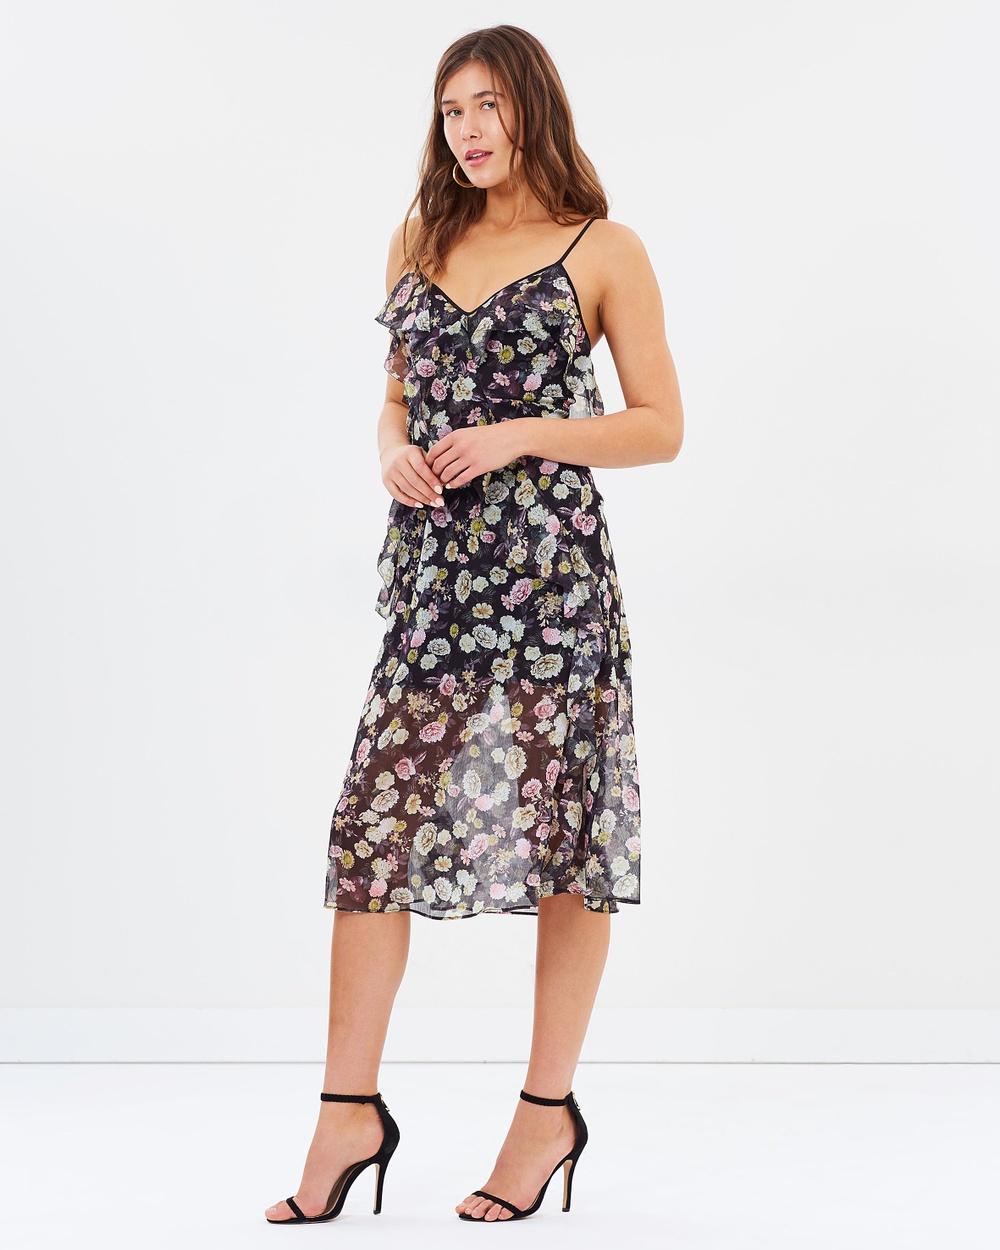 Talulah Playful Flounce Midi Dress Printed Dresses Print Playful Flounce Midi Dress